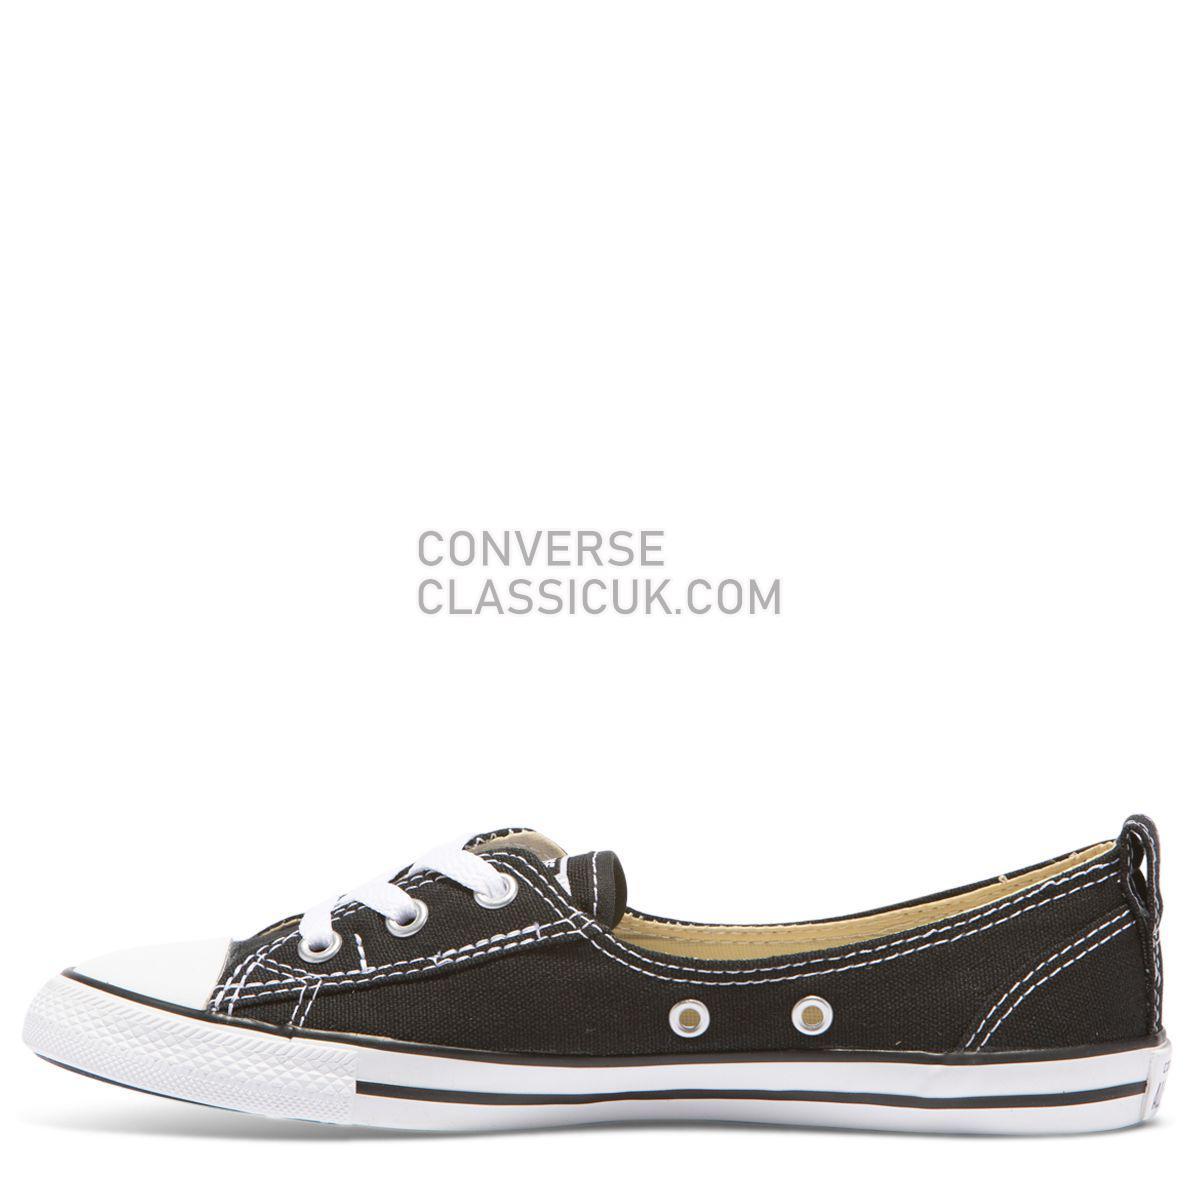 Converse Chuck Taylor All Star Dainty Ballet Slip Black Womens 547162 Black Shoes